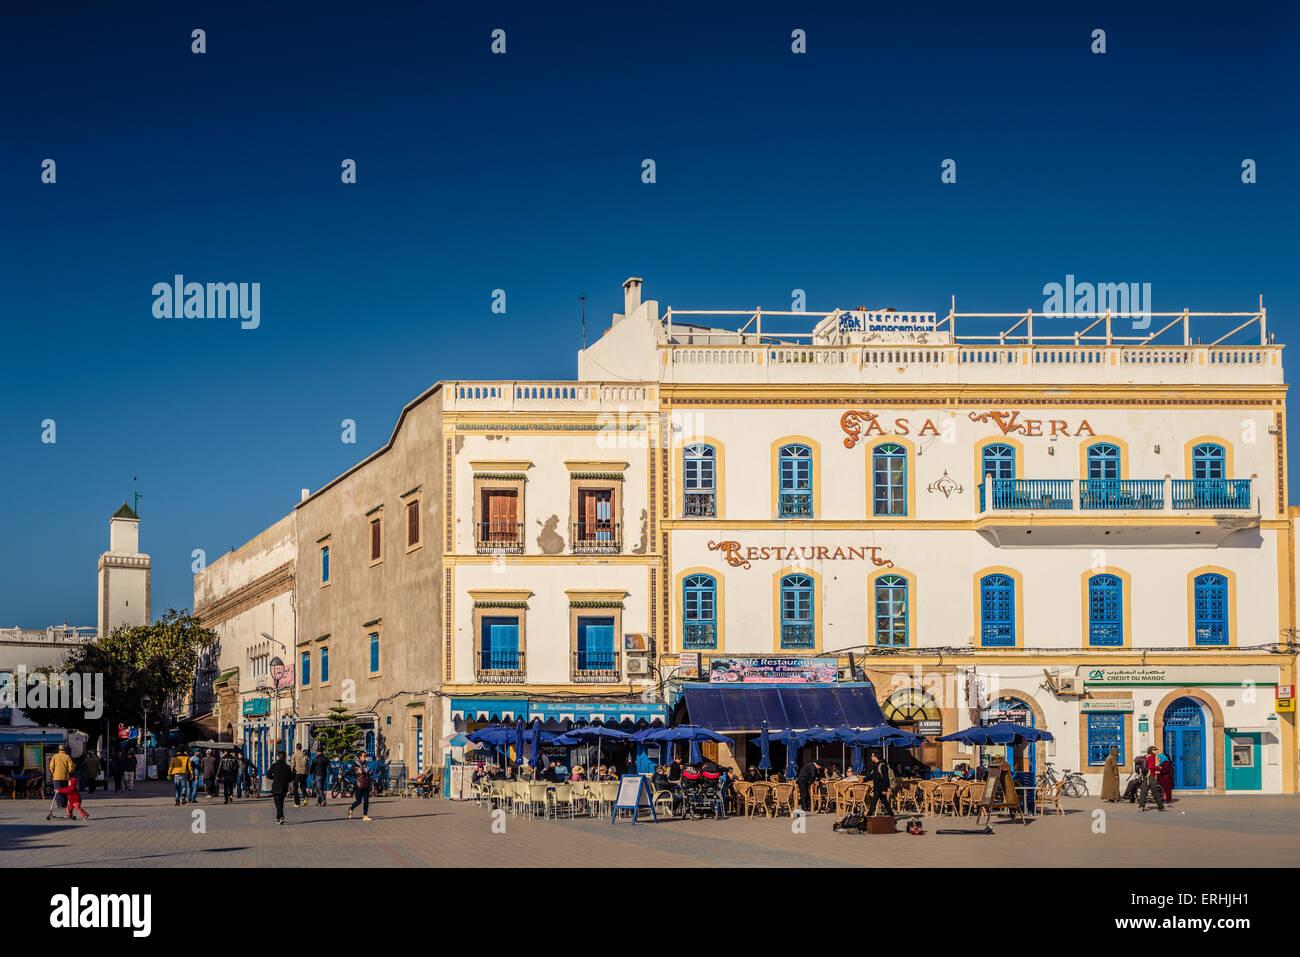 Essaouira, Morocco - 30 March 2015: typical street of Essaouira with cafèè and restaurants. Essaouira - Stock Image